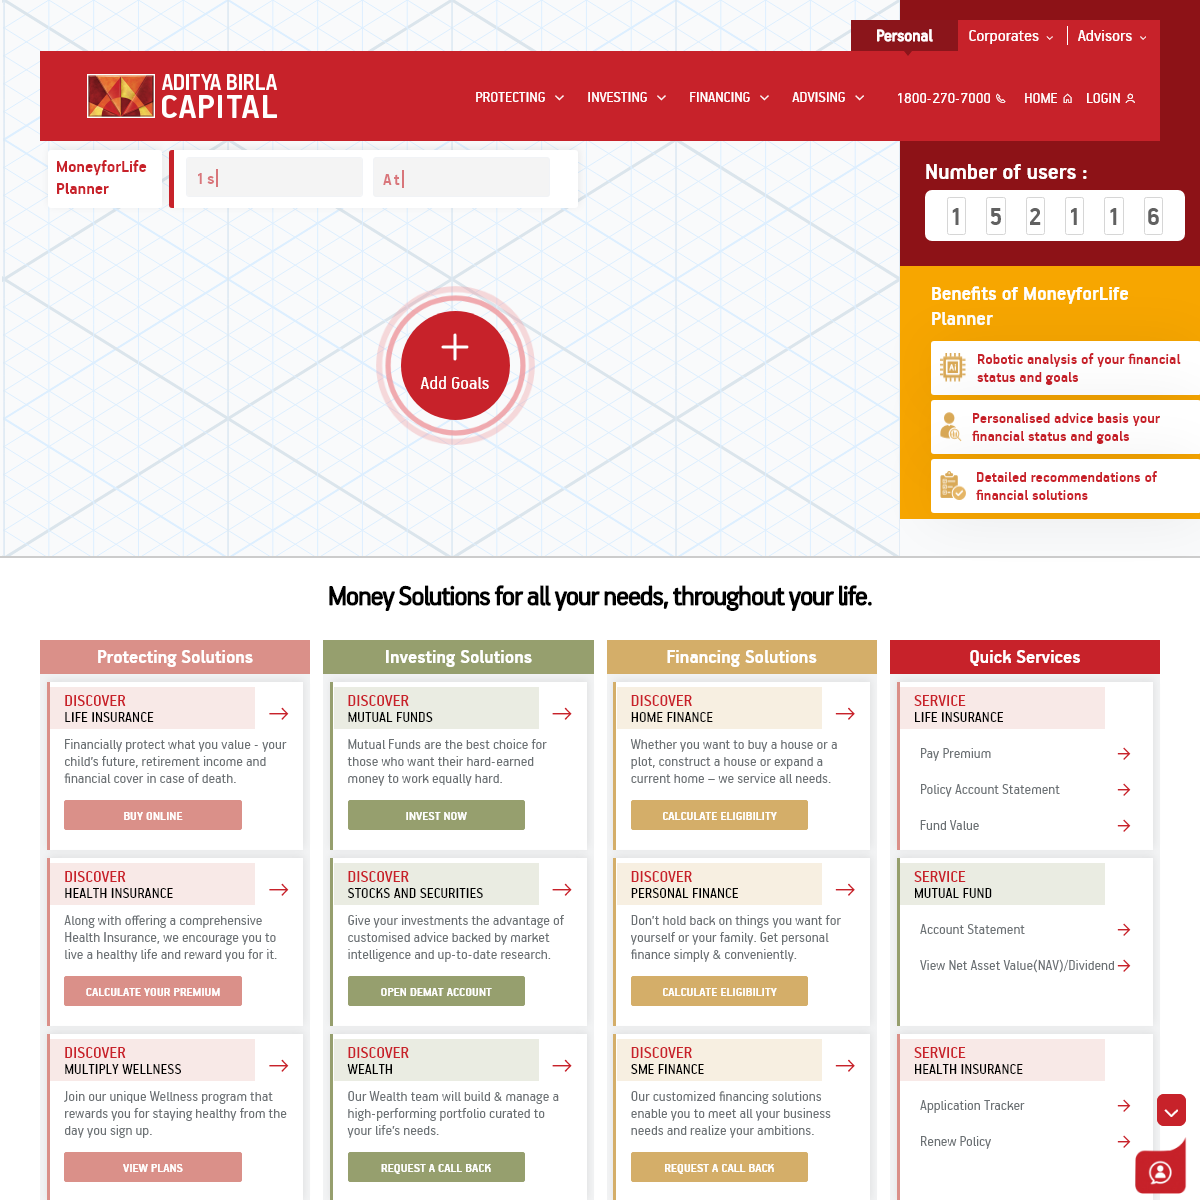 Financial Solutions - Financial Services Providers in India - Aditya Birla Capital